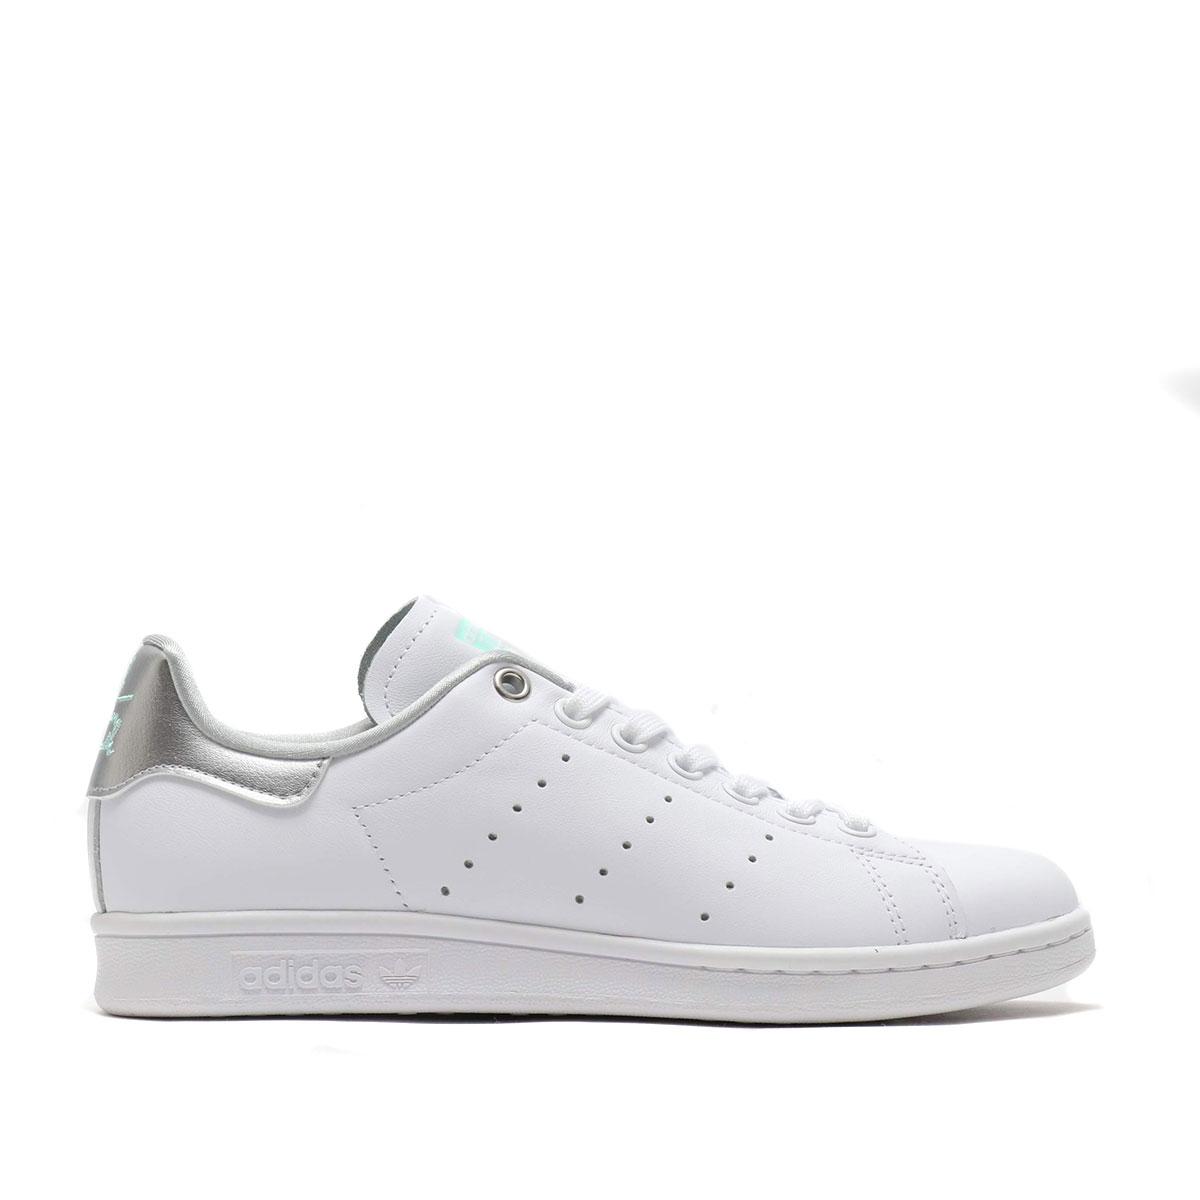 adidas Originals STAN SMITH W(FTWR WHITE/SILVER MET./CLEAR MINT)(アディダスオリジナルス スタンスミス W)【レディース】【スニーカー】【19SS-I】